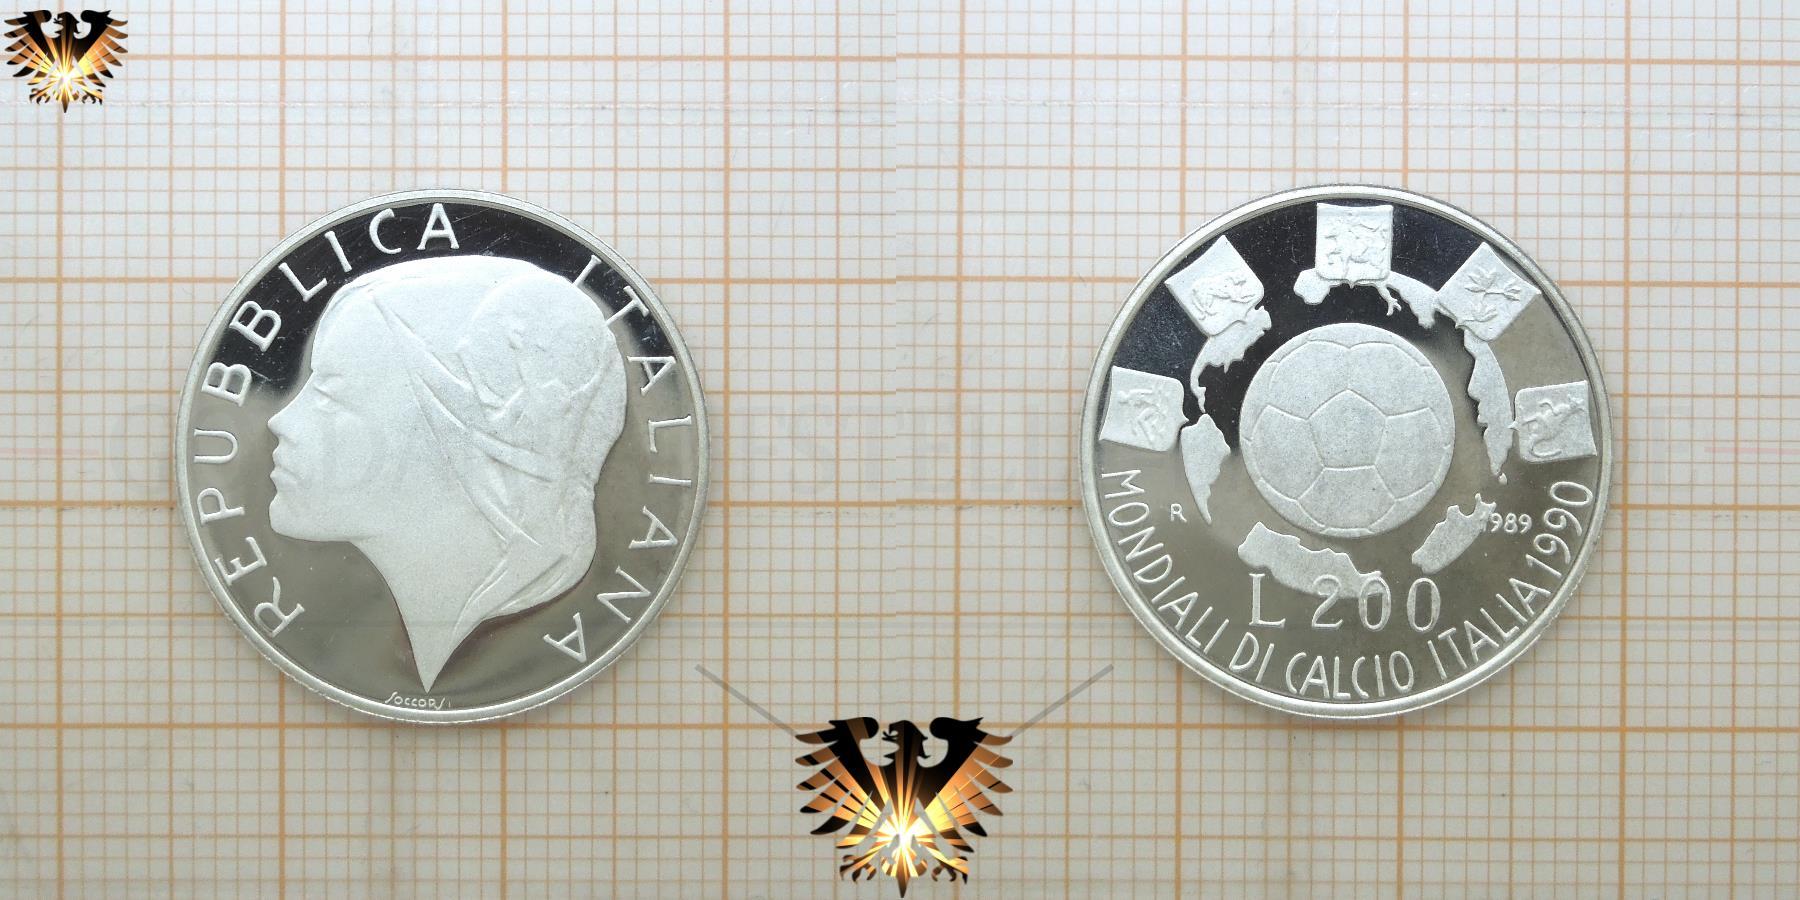 200 Lire Silbermunze Repubblica Italiana Wm 1990 In